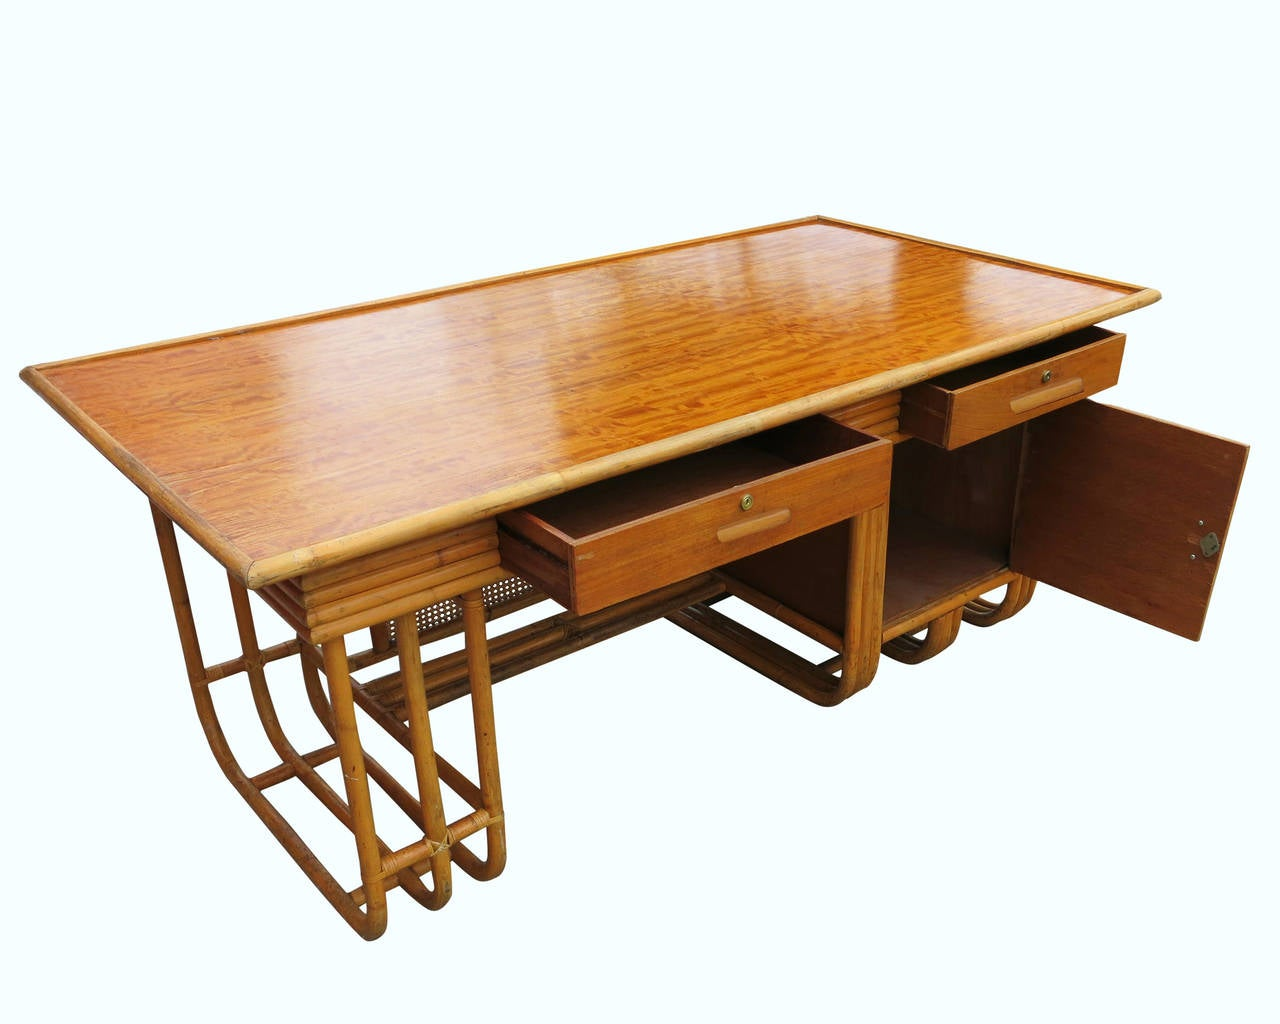 Streamlined Moderne Restored Large Jean Royère Style Streamline Rattan Executive Desk For Sale